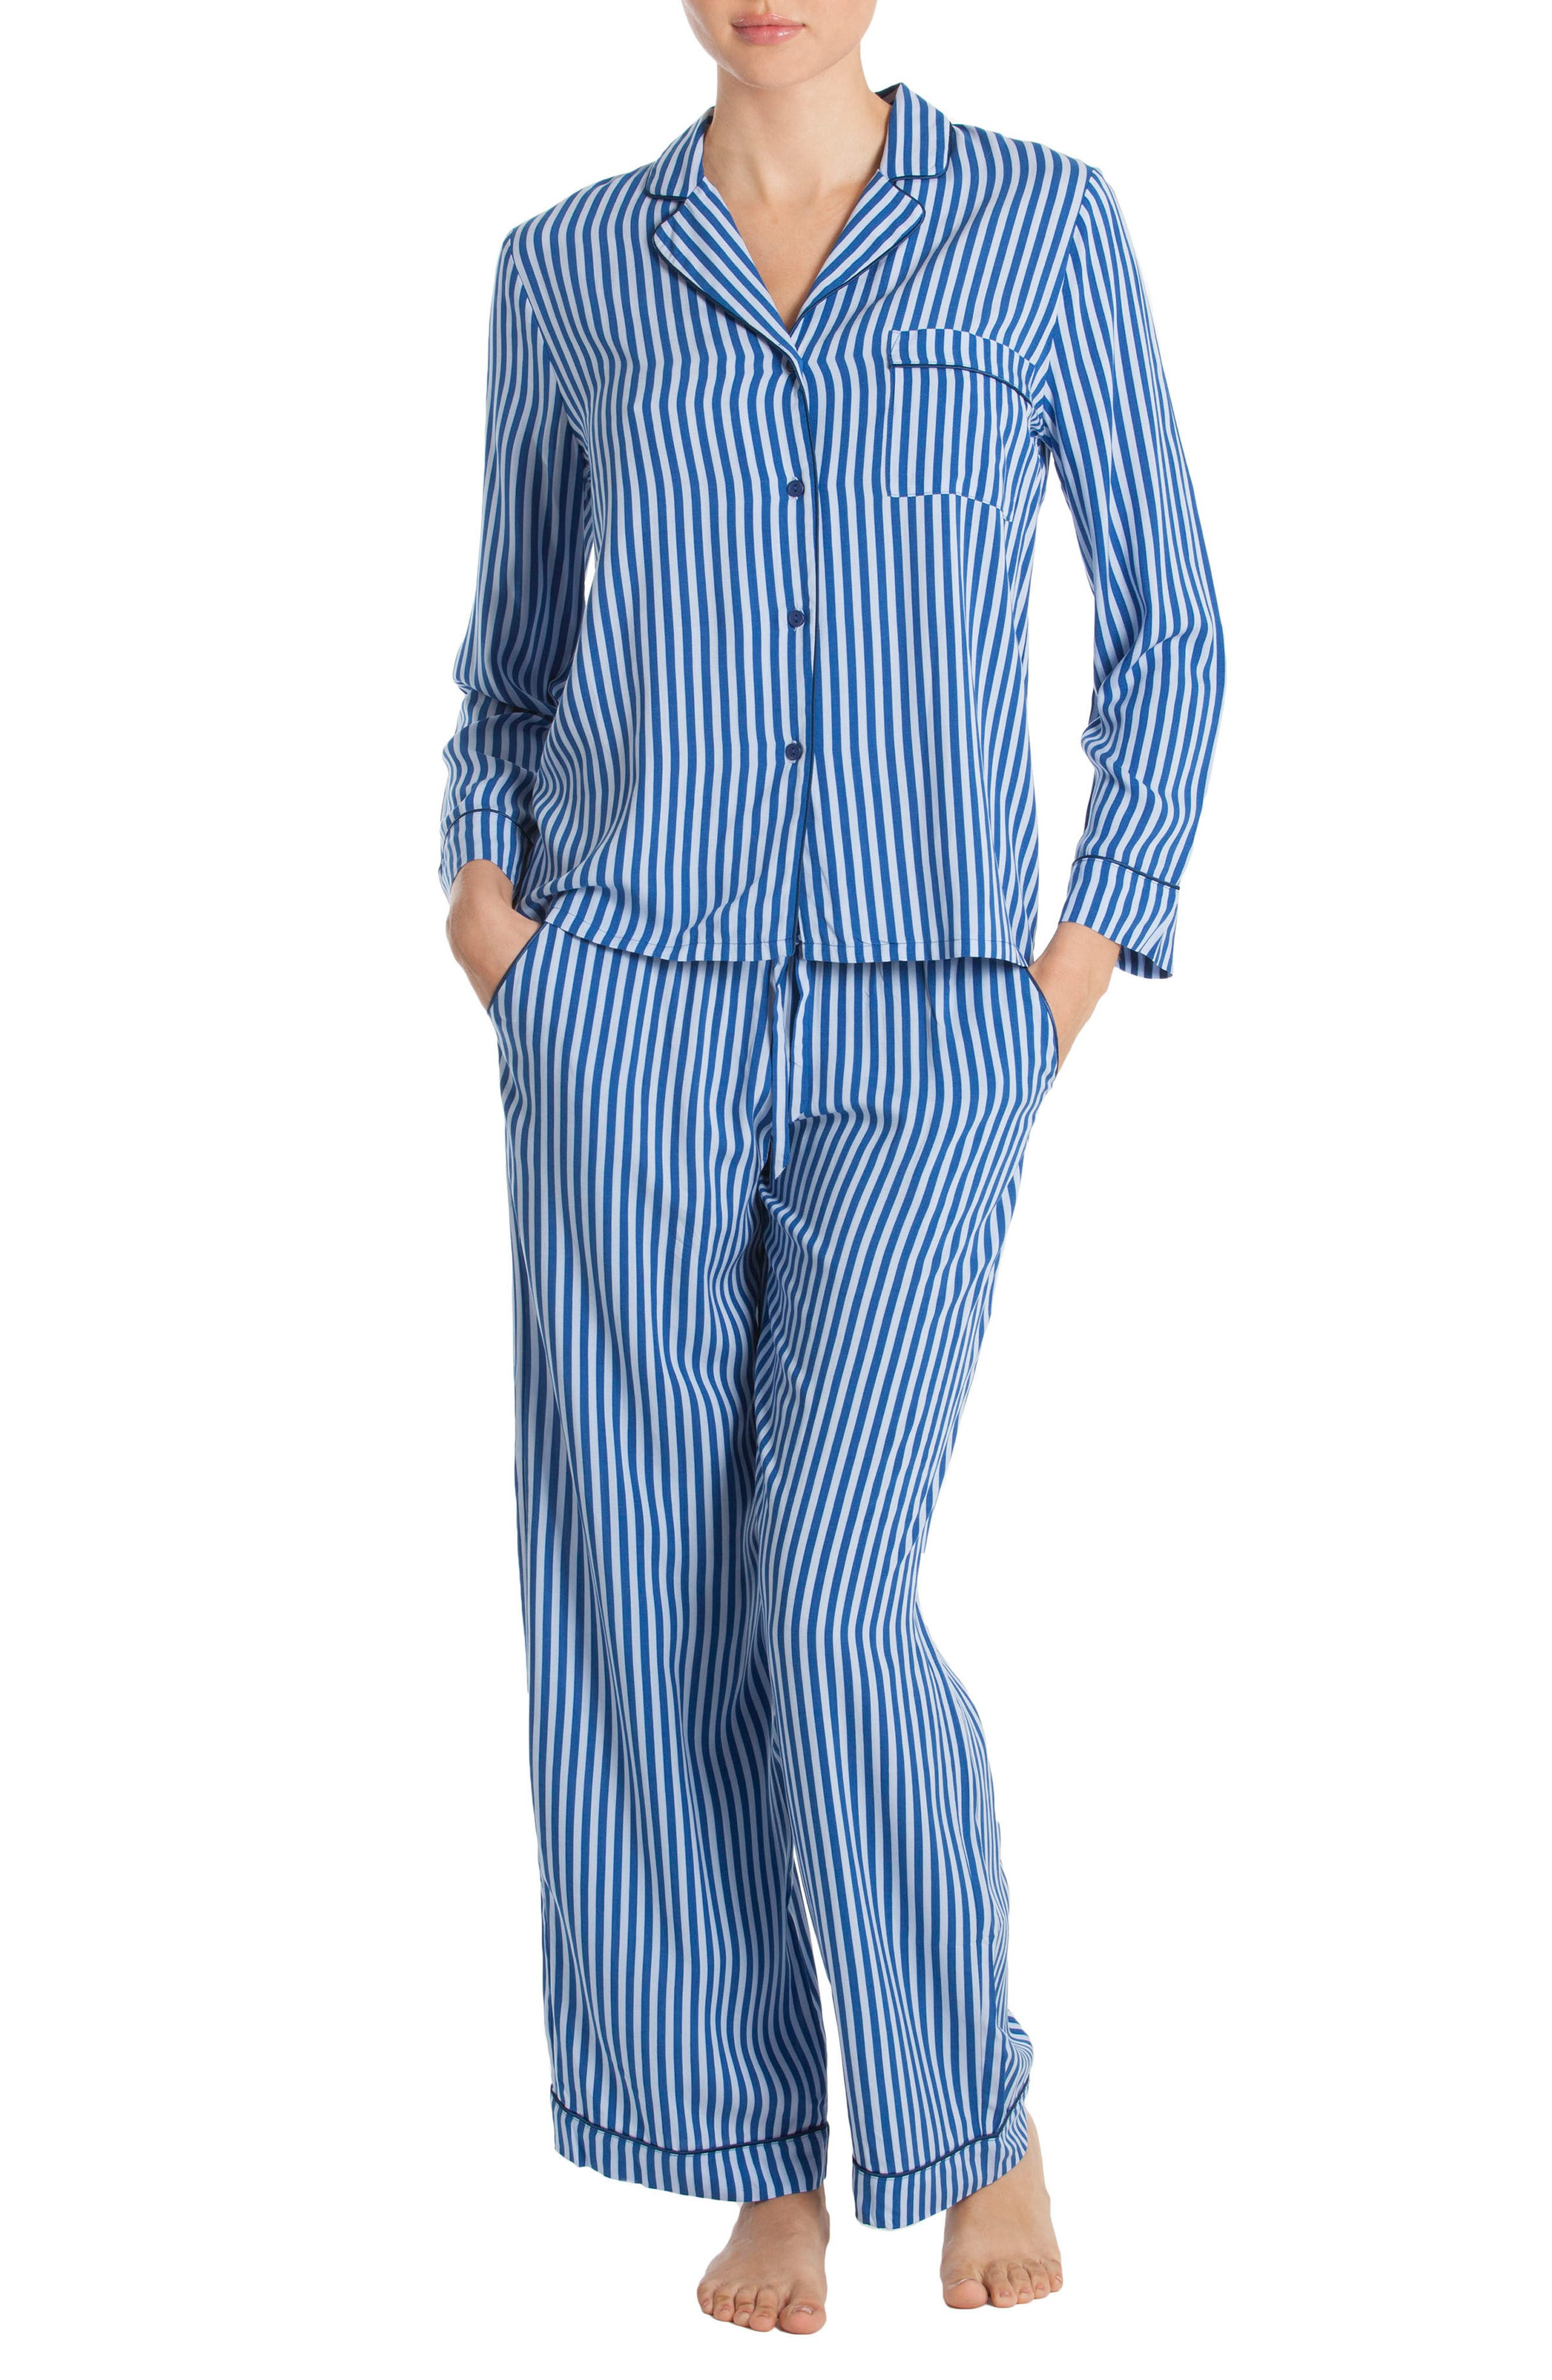 Stripe Pajamas,                             Main thumbnail 1, color,                             400